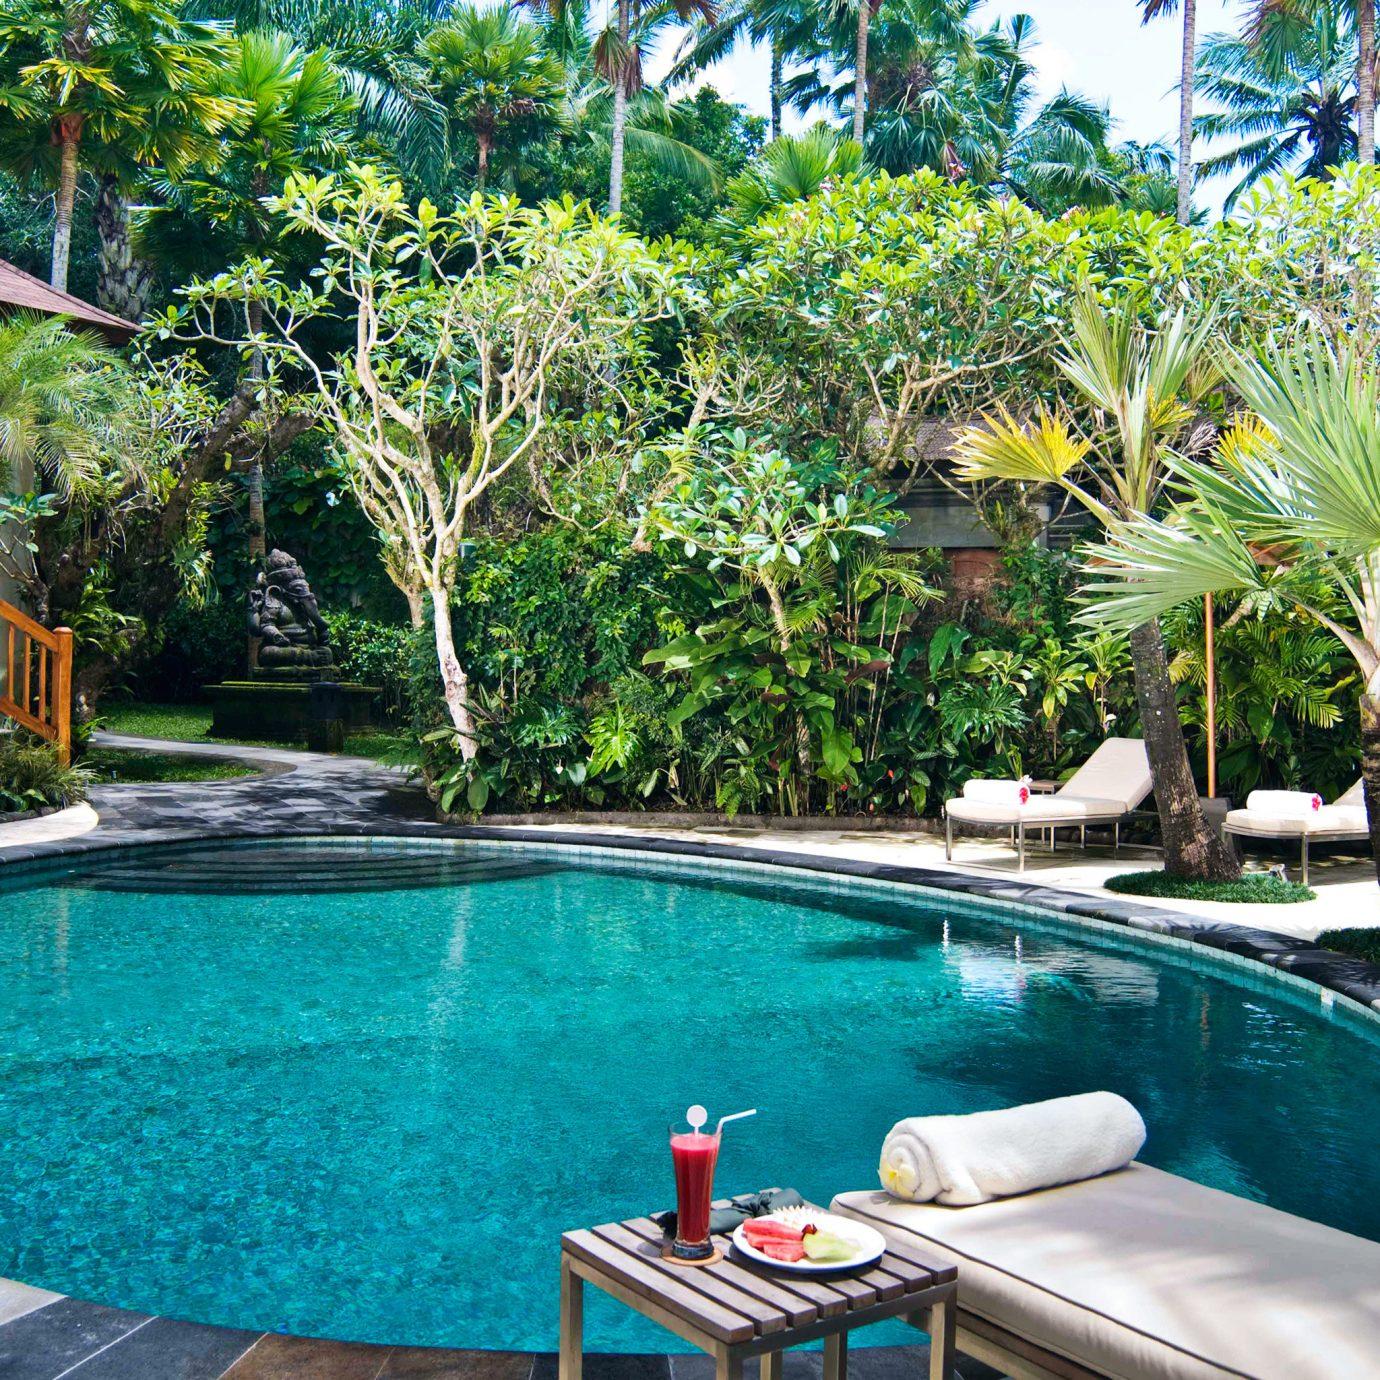 Adventure Pool Safari tree water swimming pool property Resort leisure backyard Villa eco hotel condominium caribbean swimming